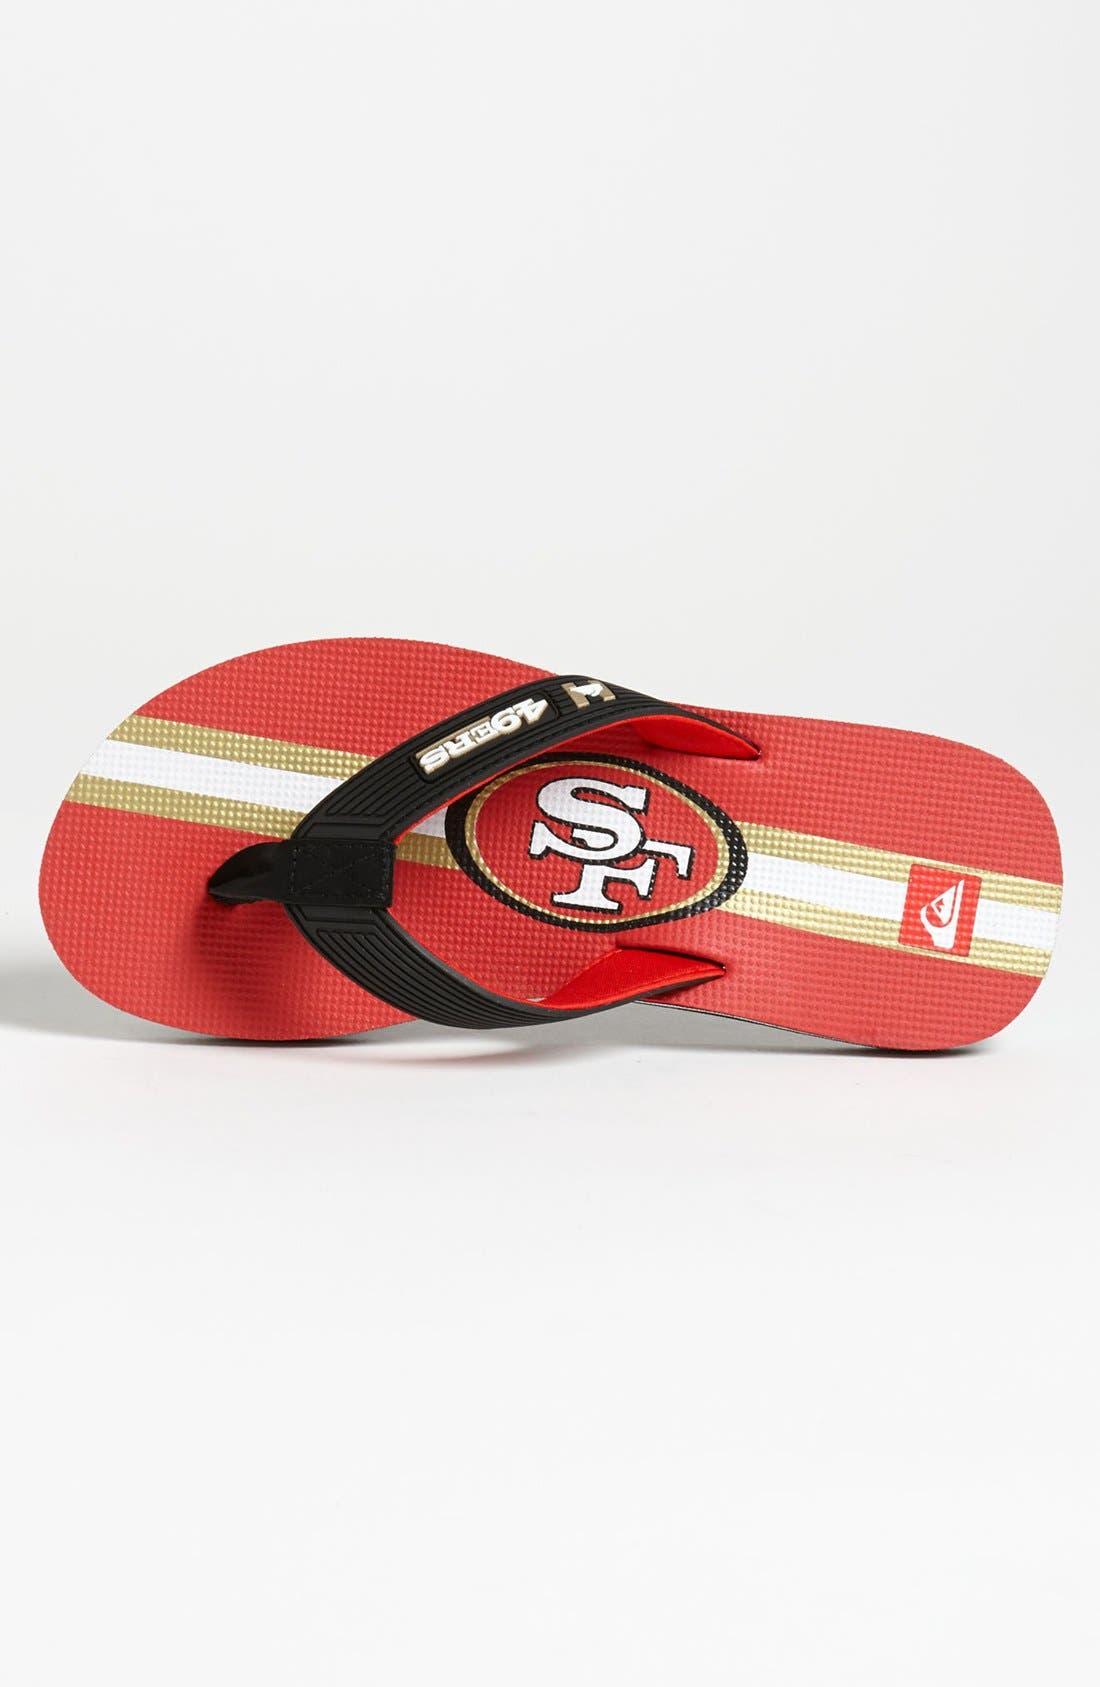 Alternate Image 3  - Quiksilver 'NFL' Flip Flop (Men)